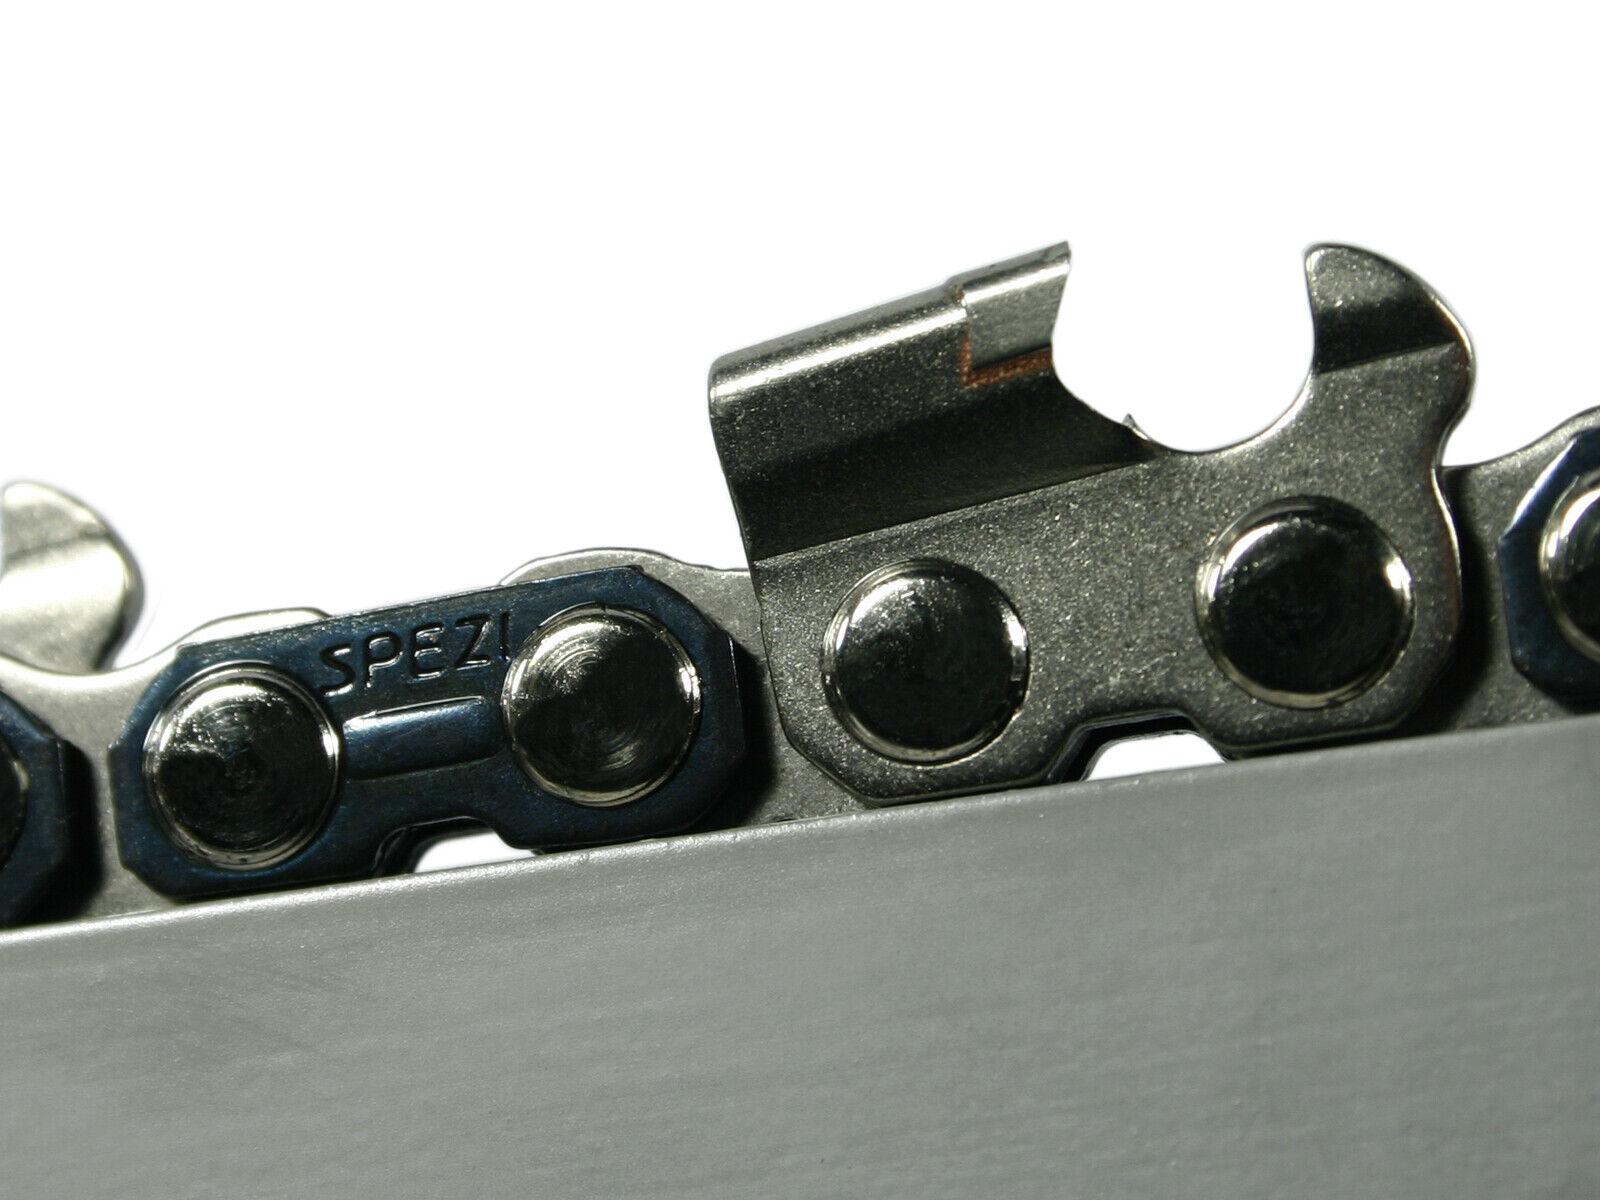 Metal duro para sierra cadena compatible con still 039 Av MS 390 45 cm 3 8  66tg 1,6mm Chain